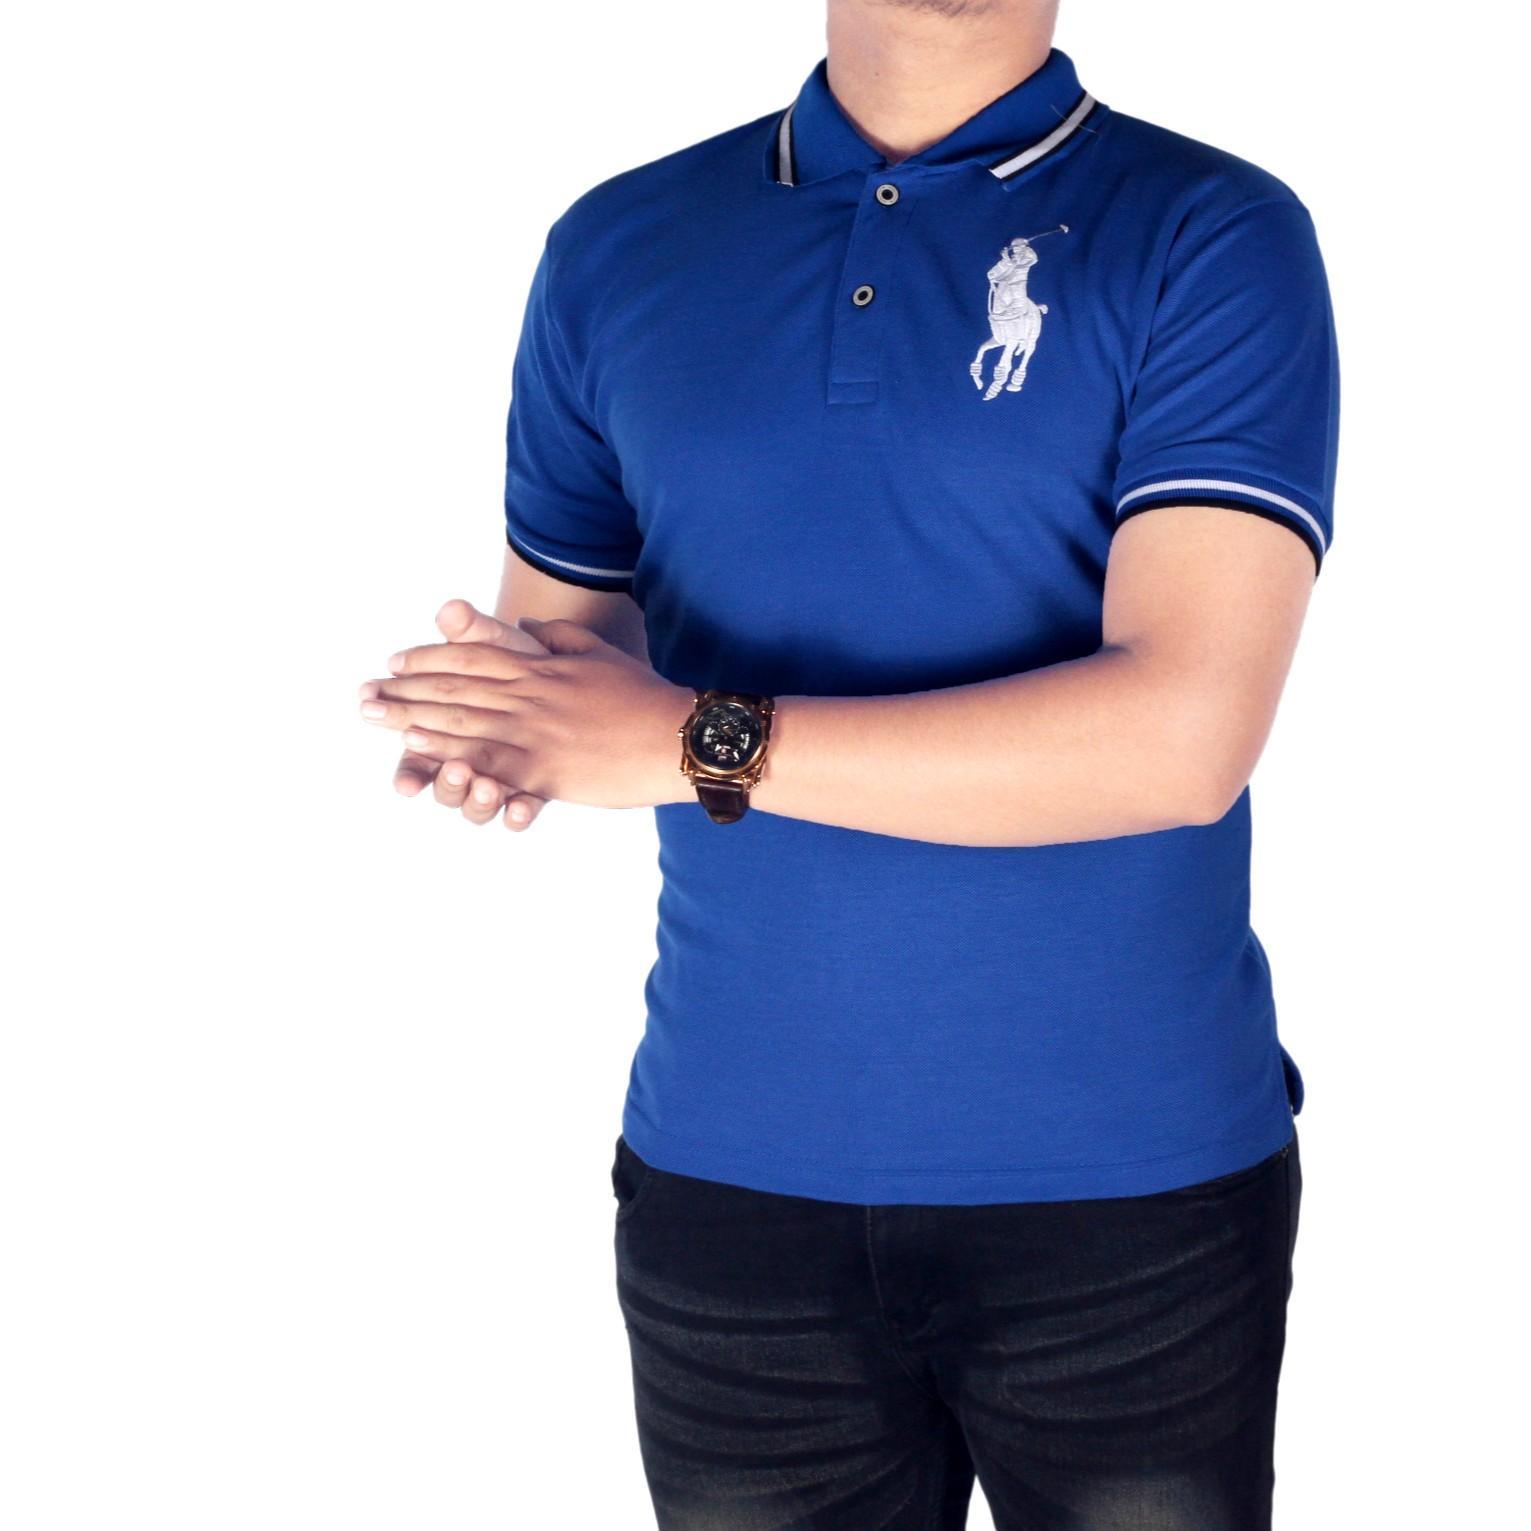 Dgm_Fashion1 Polo Shirt Polos Biru Murah/ Kaos polo Combinasi/ kaos polos polo/ kaos polo/ kaos polo berkerah/ kaos polo polos/ kaos kerah polo shirt/ kaos polo pria/Polo Six/Polo Monkl/Kaos Kerah/Kaos Man IP 3910